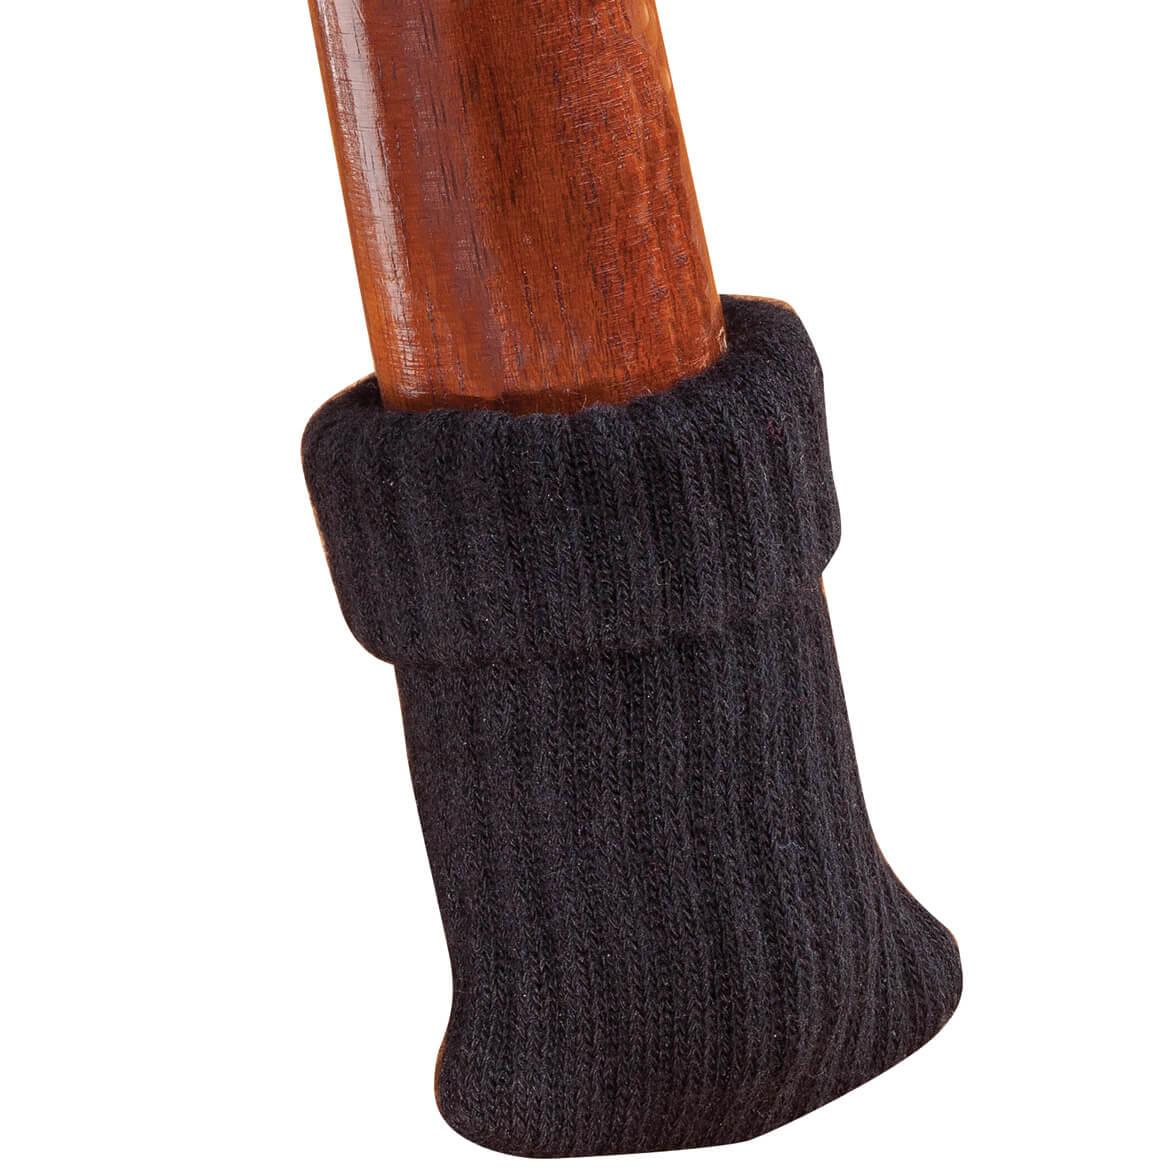 Furniture Socks Set of 8